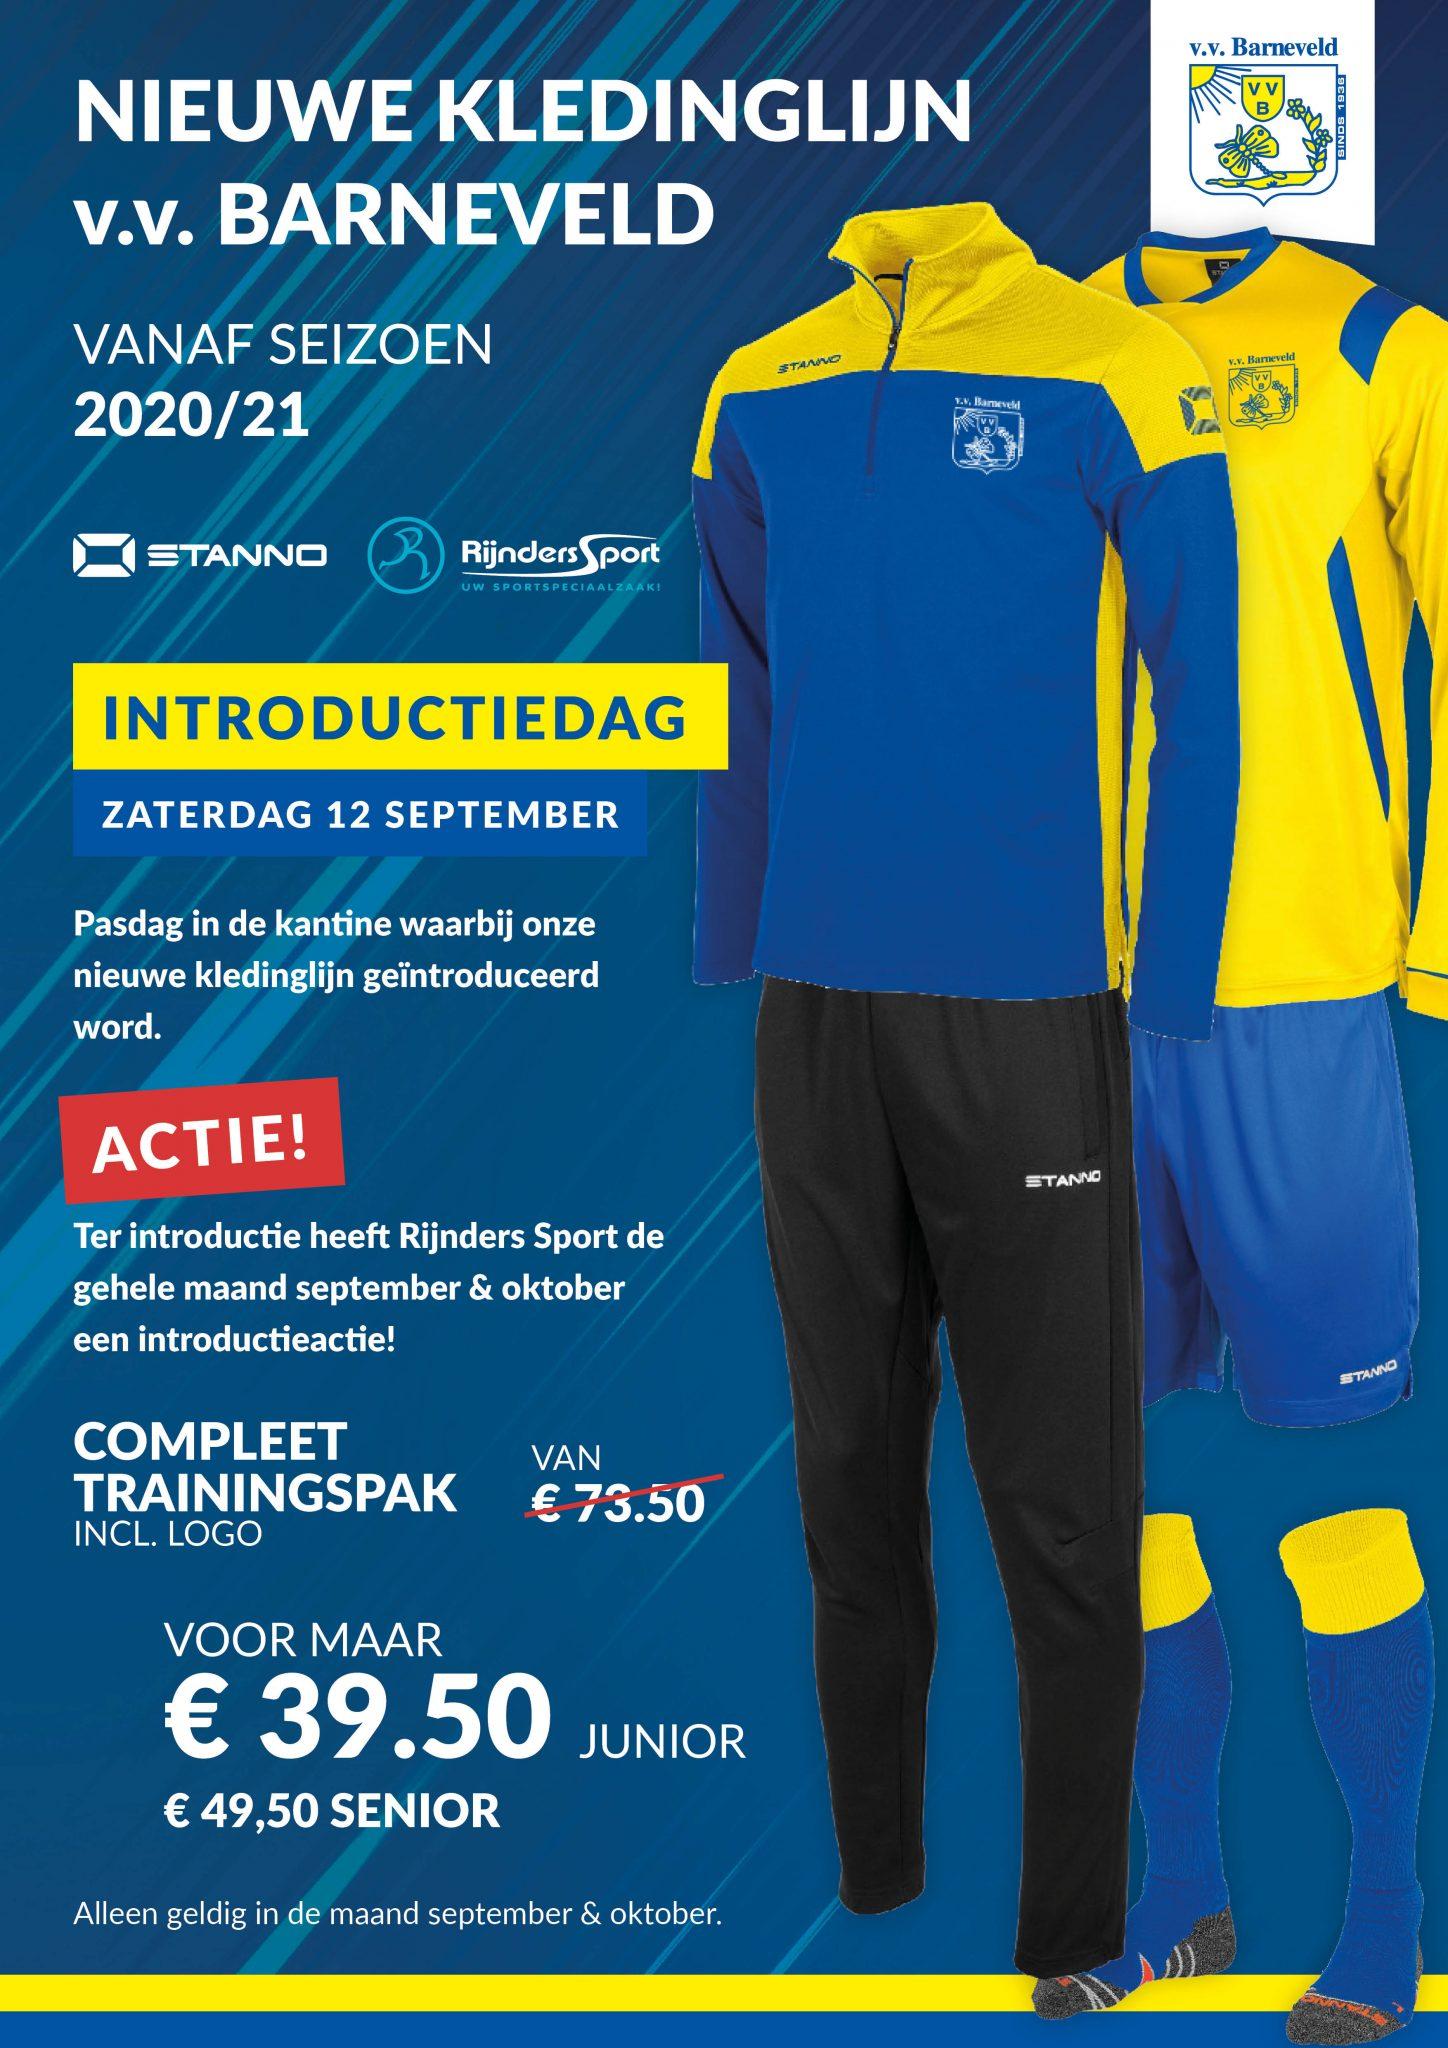 Introductie nieuwe kledinglijn 2020/2021